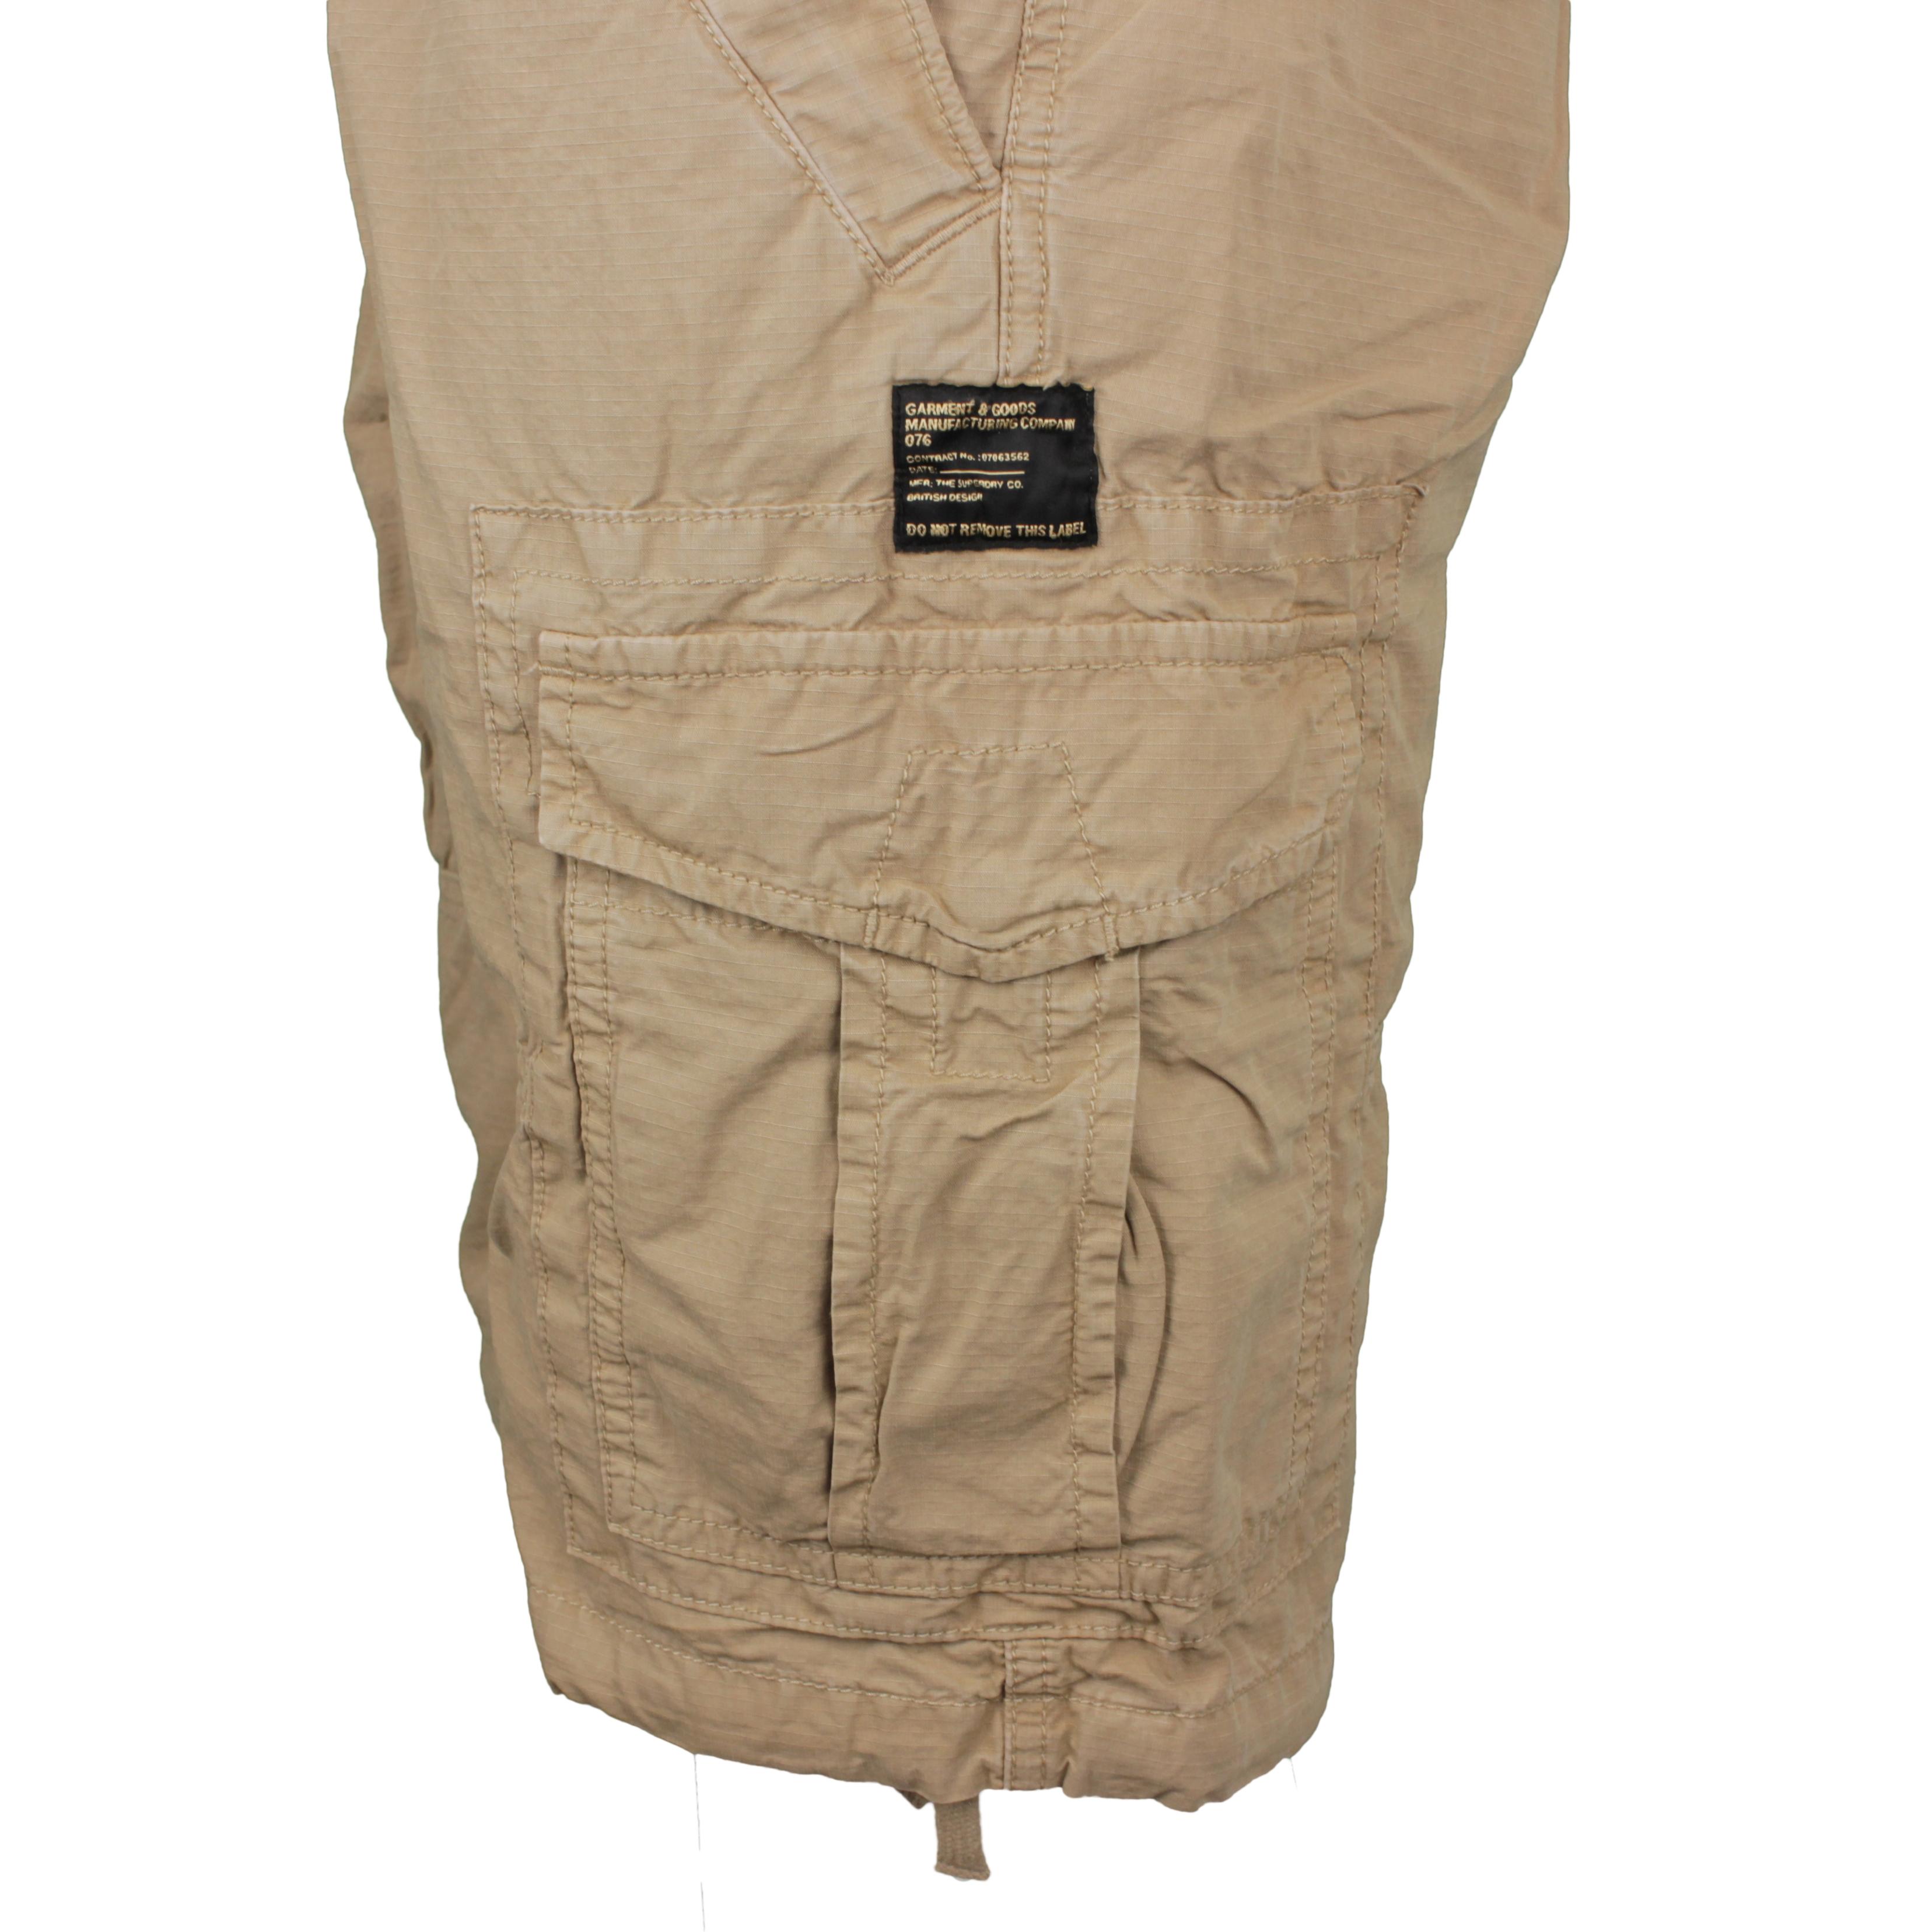 Superdry Parachute Cargo Short beige M7110249A 13K sand